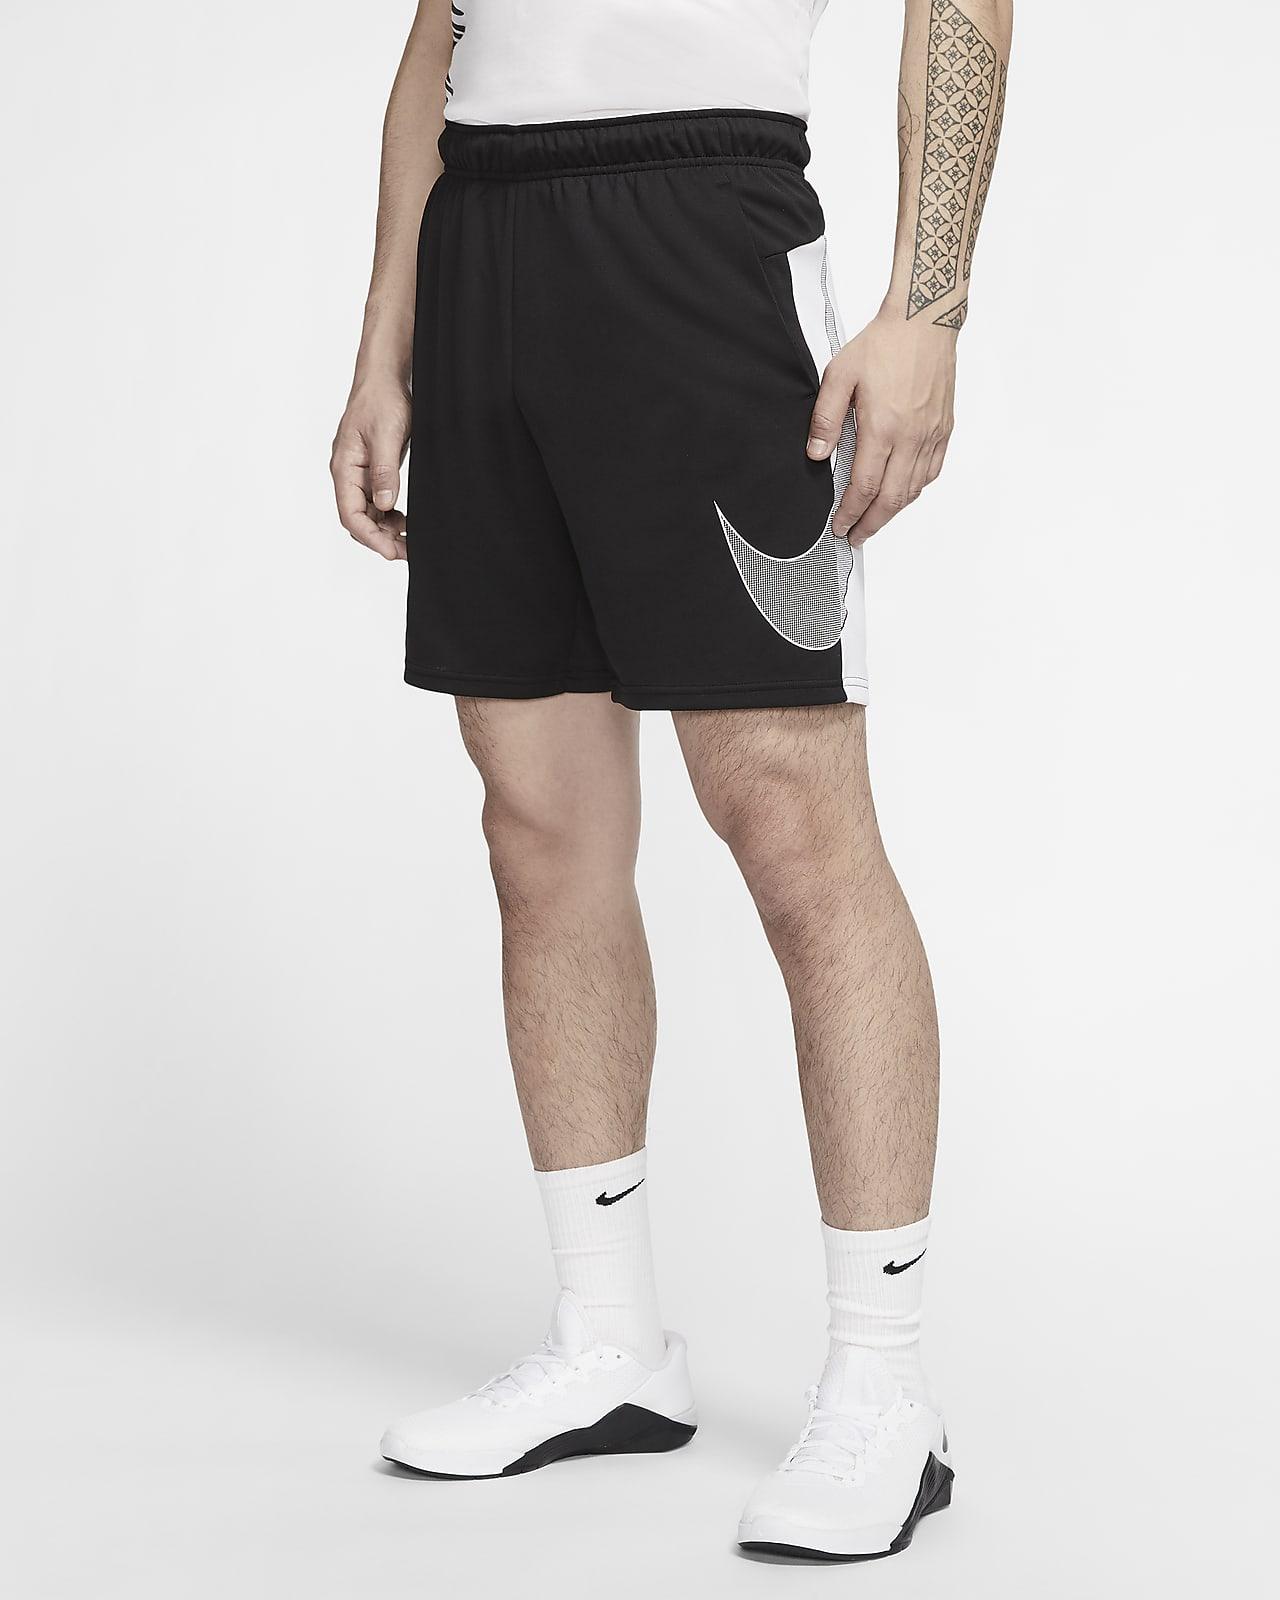 Nike Dri-FIT Men's Graphic Training Shorts